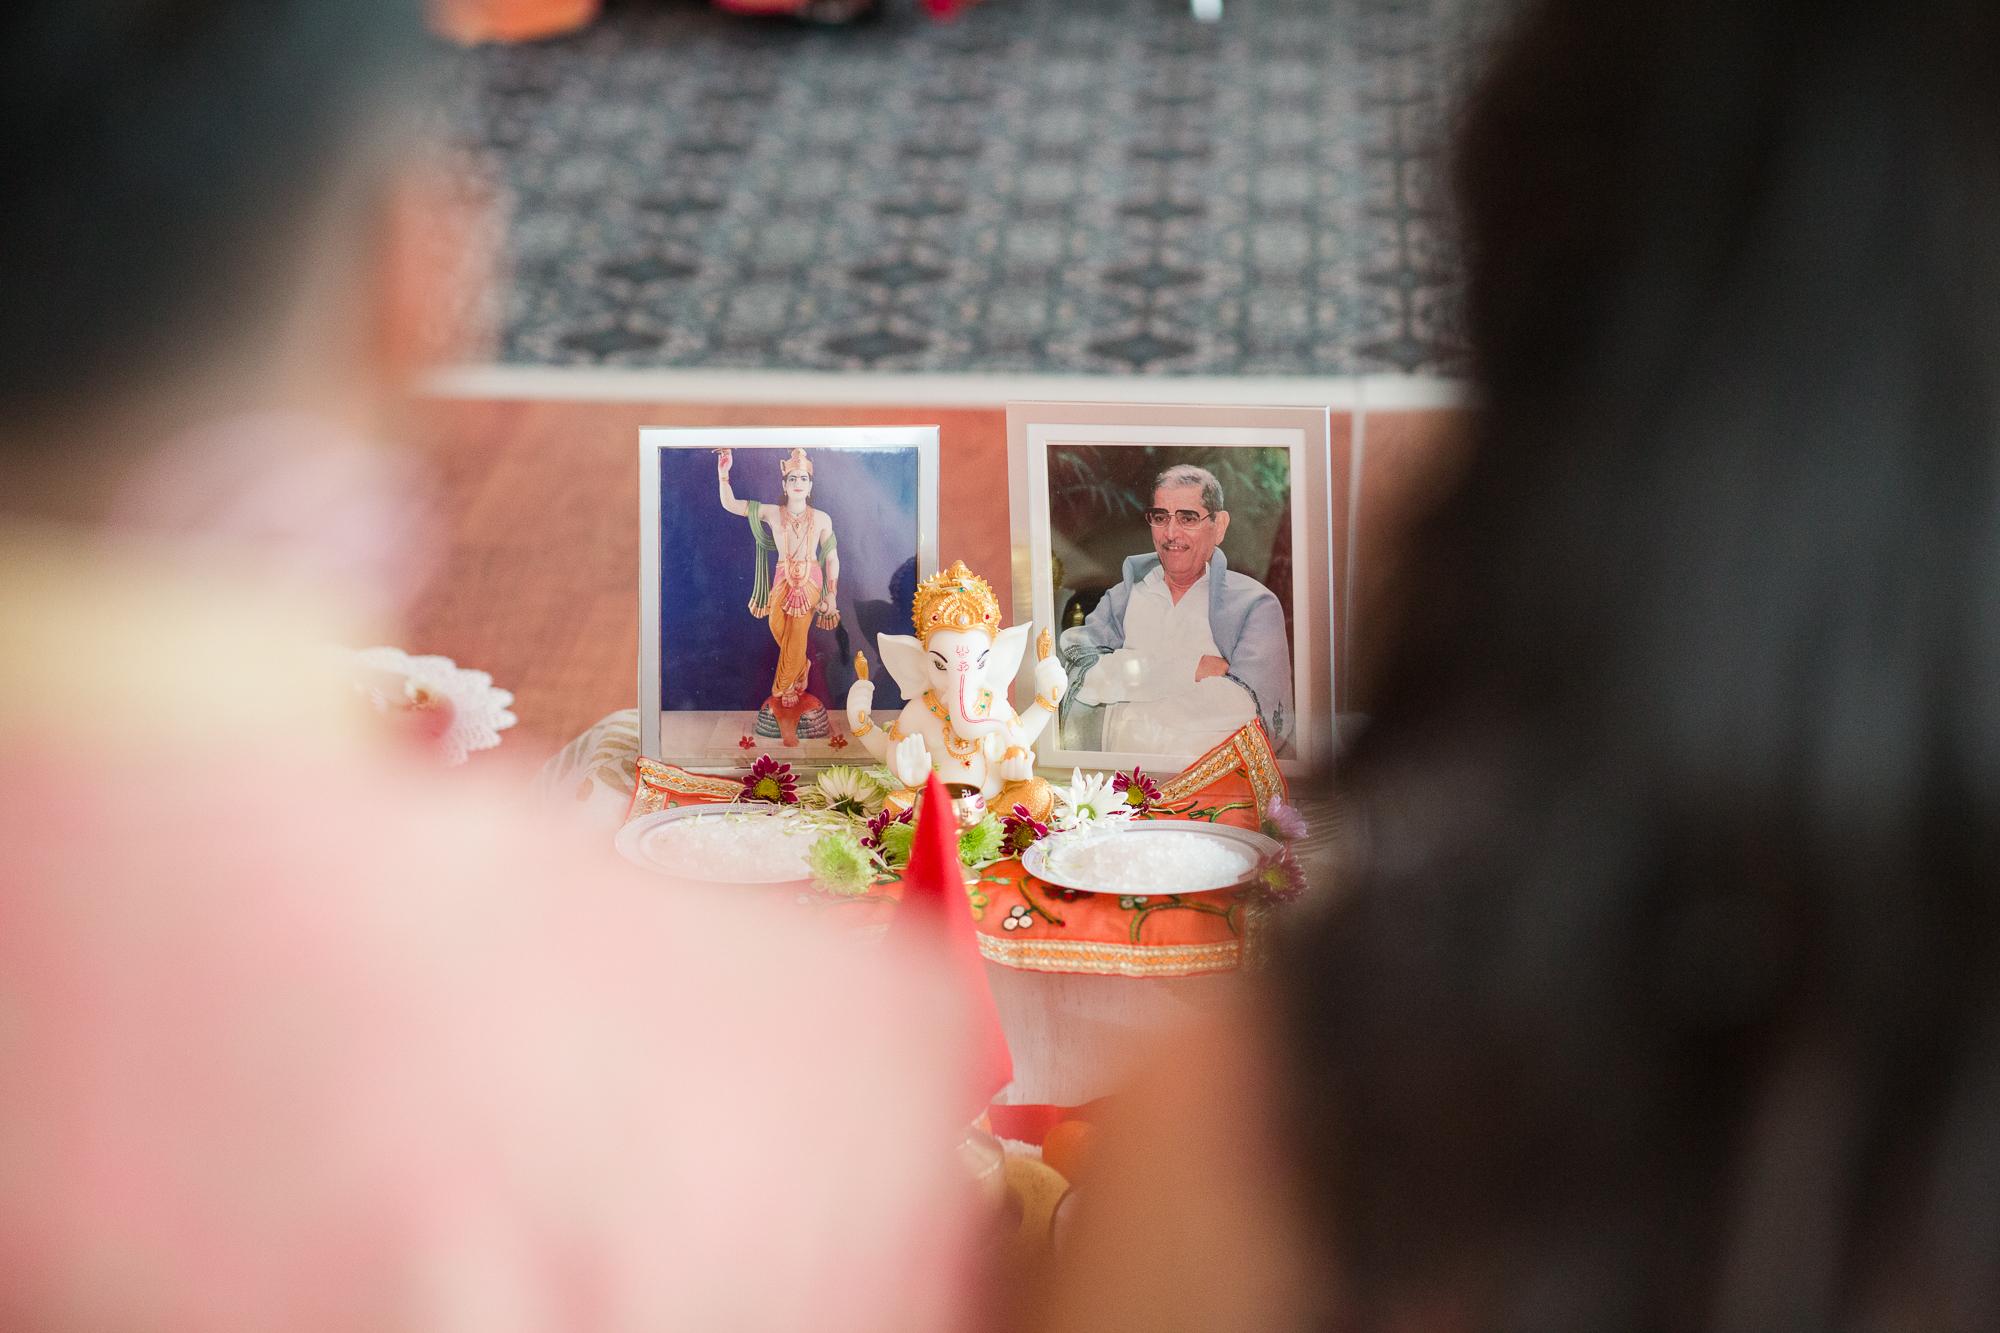 anumeet and gopika, indian engagement ring ceremony, top of the town, alexandria, northern virginia, nova weddings-63.jpg